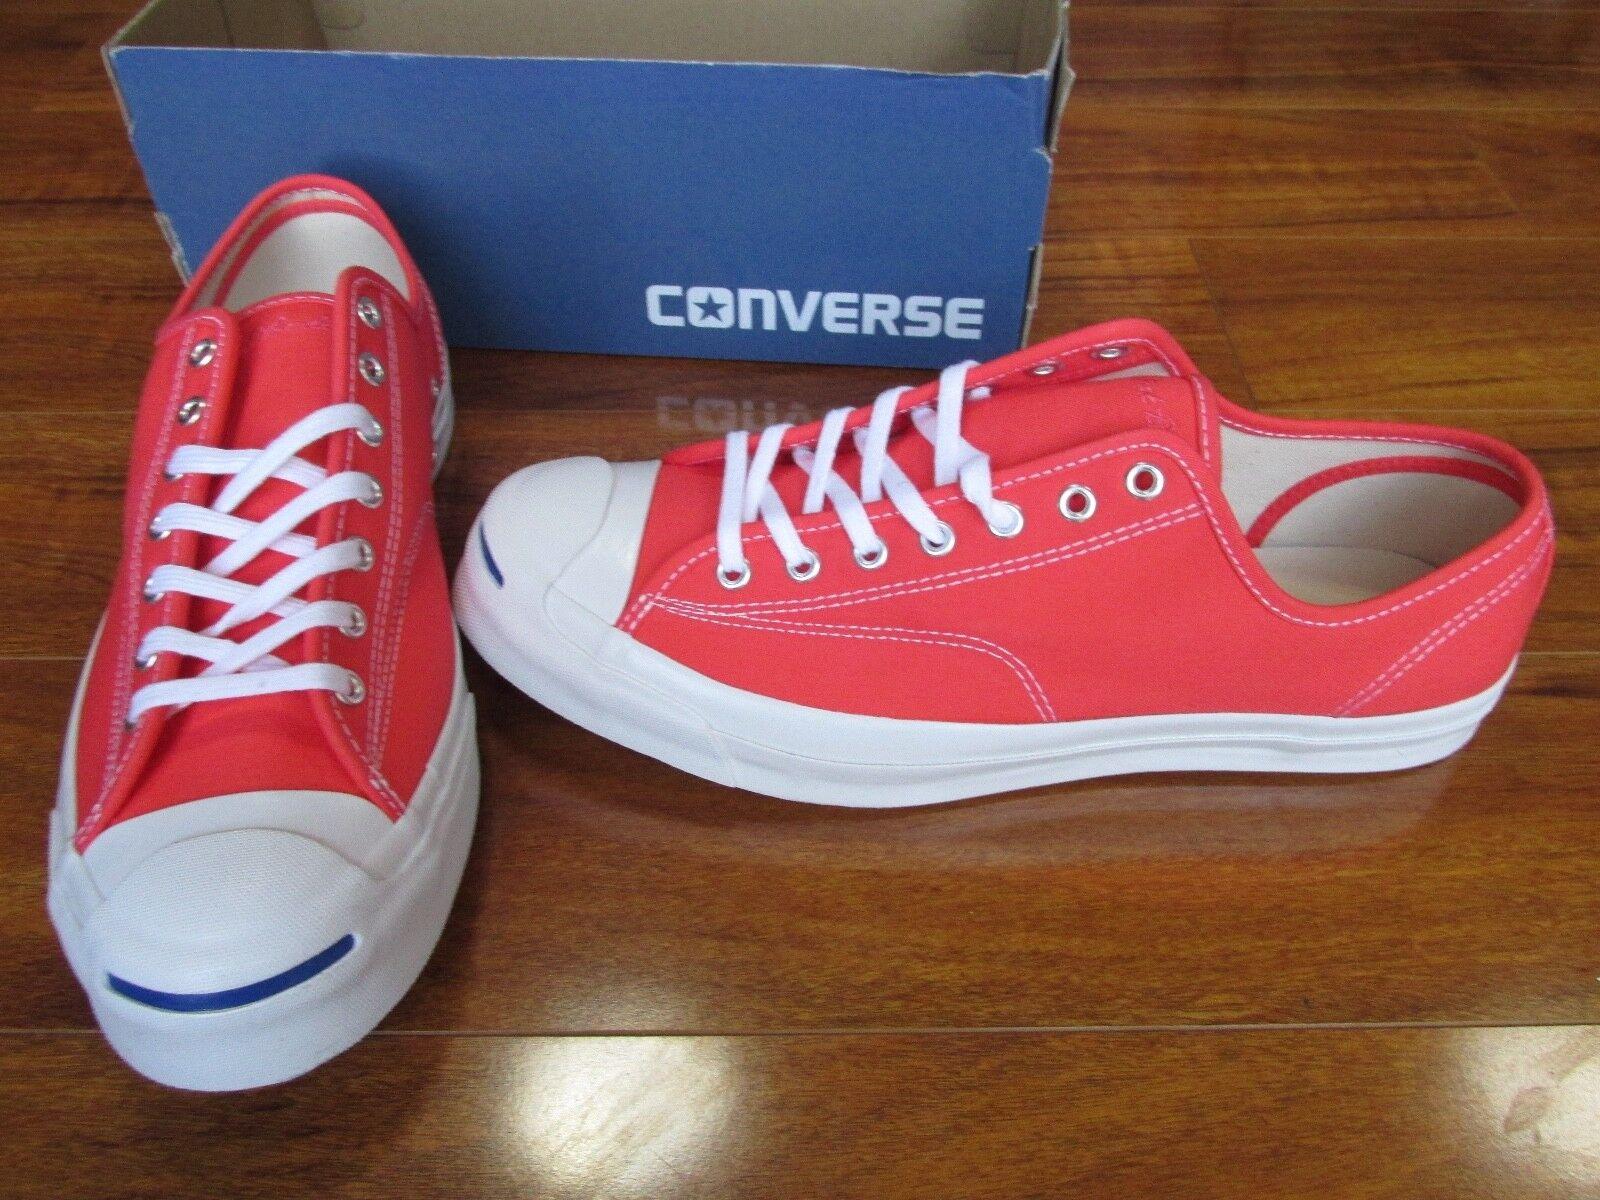 NEW Converse Jack Purcell Signature Ox shoes MEN 11.5 Hyper orange 155592C